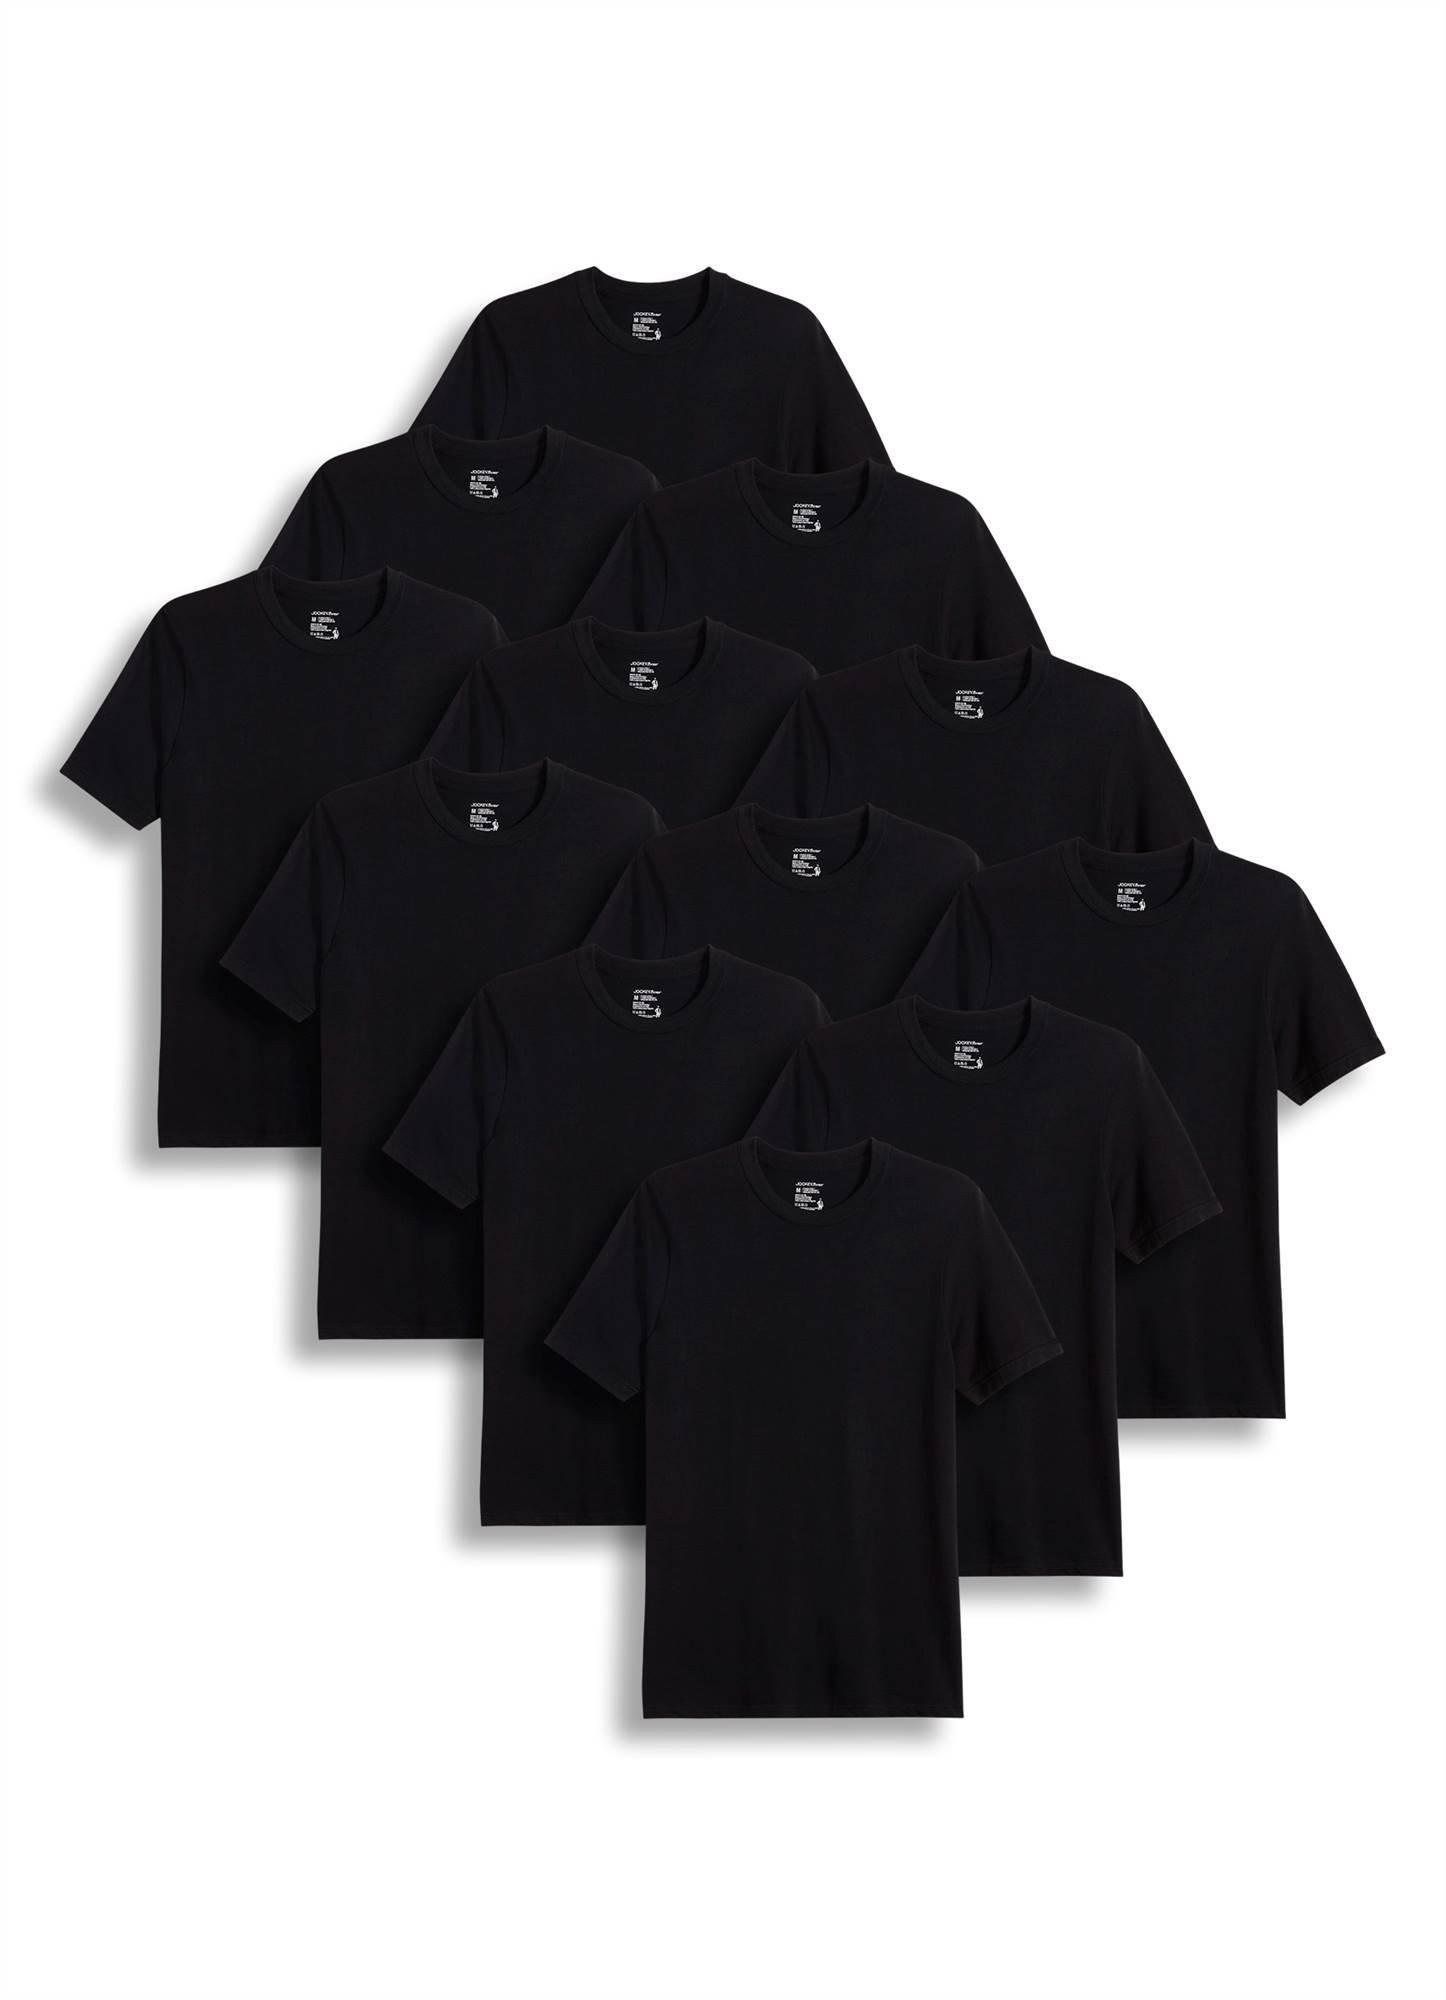 Jockey Men's T-Shirts Big & Tall Classic Crew Neck T-Shirt - 12 Pack, Black, 2XL